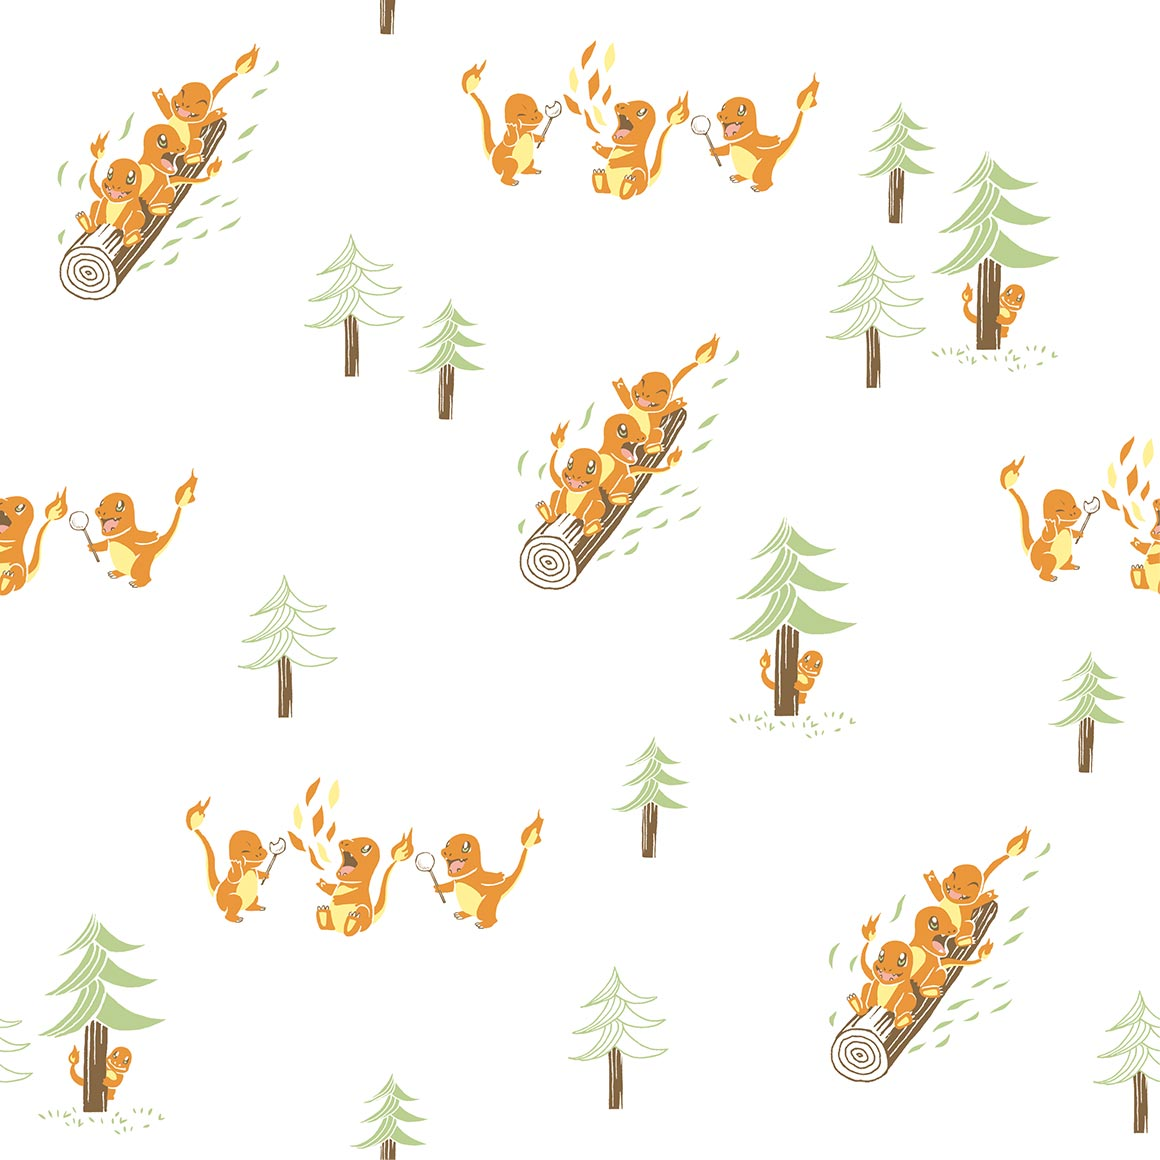 Franchise Pokemon Bekerja Sama Dengan Original Stitch Untuk Ciptakan Kemeja Kerja Dengan Motif Pikachu Dan Kawan-Kawan !